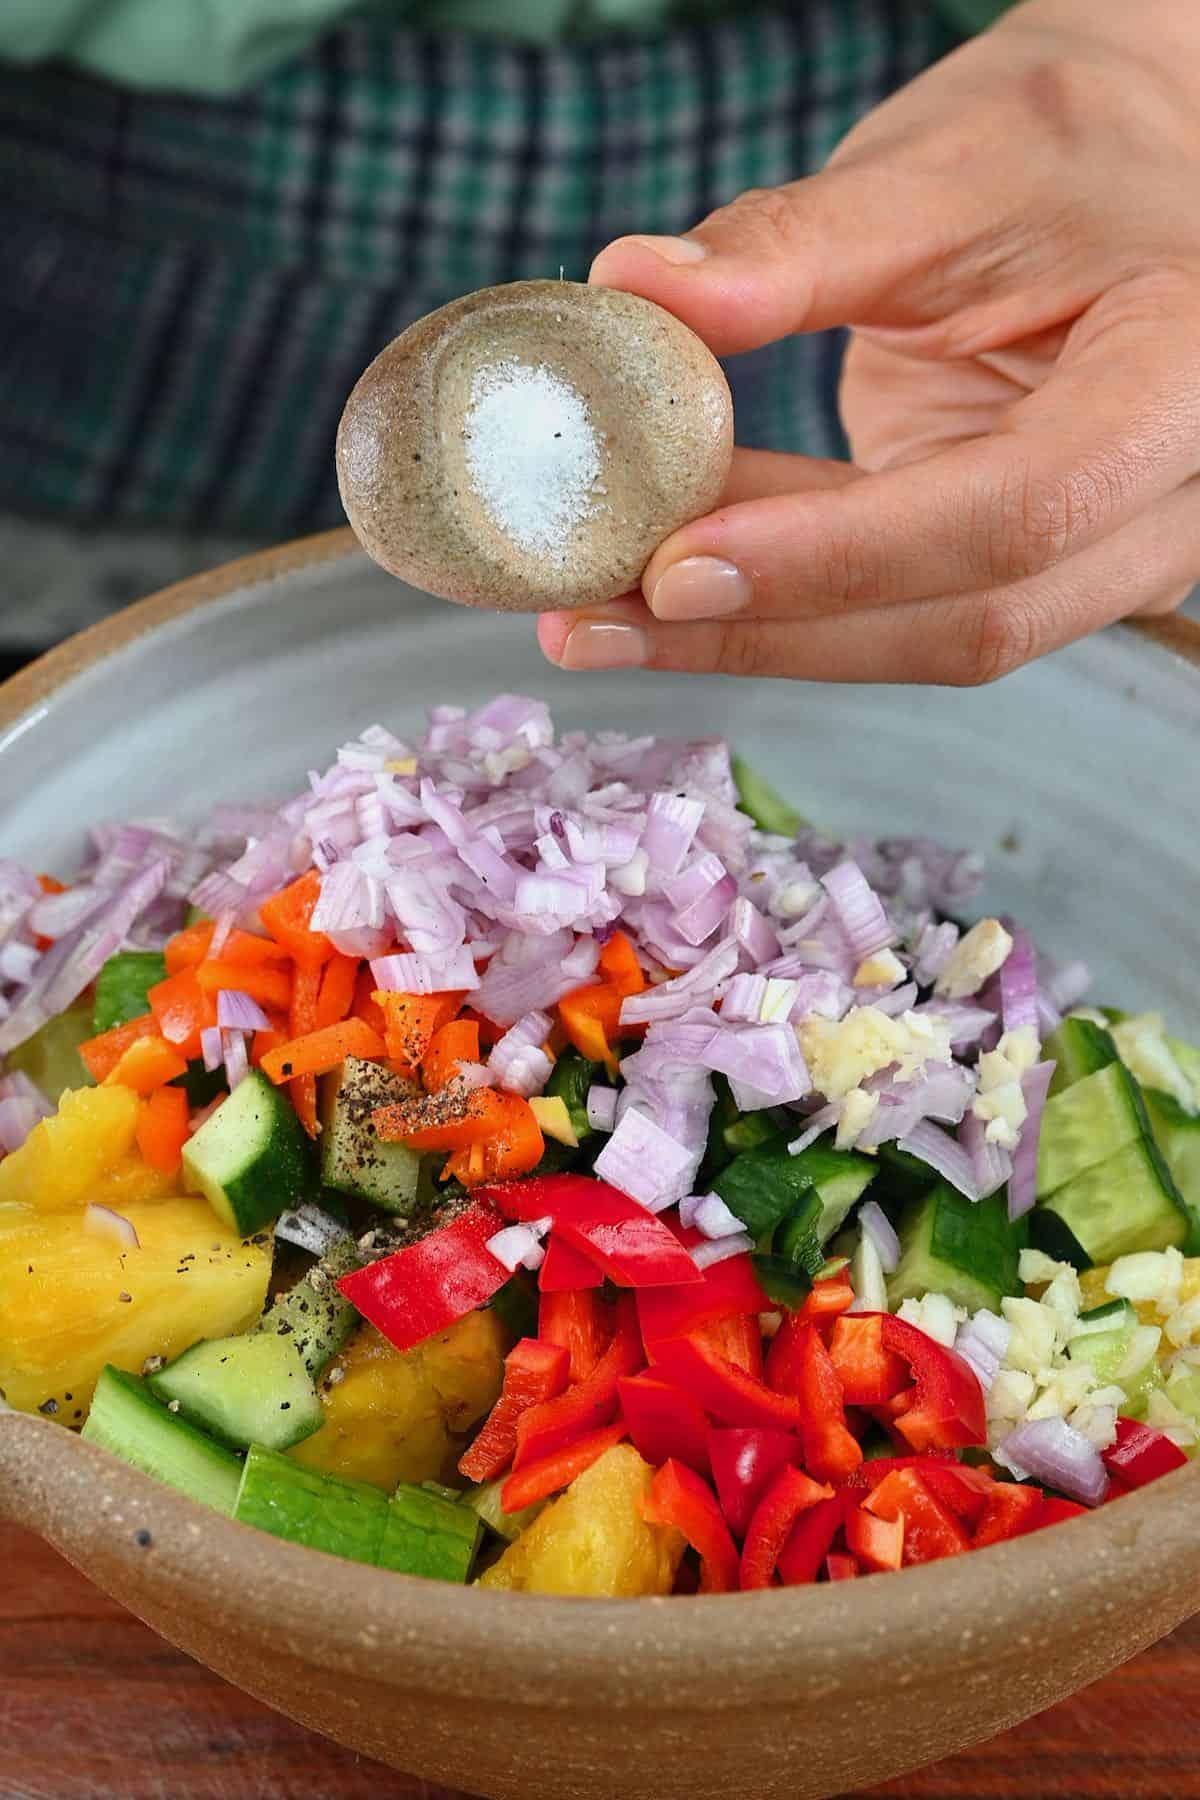 Adding salt to pineapple salad